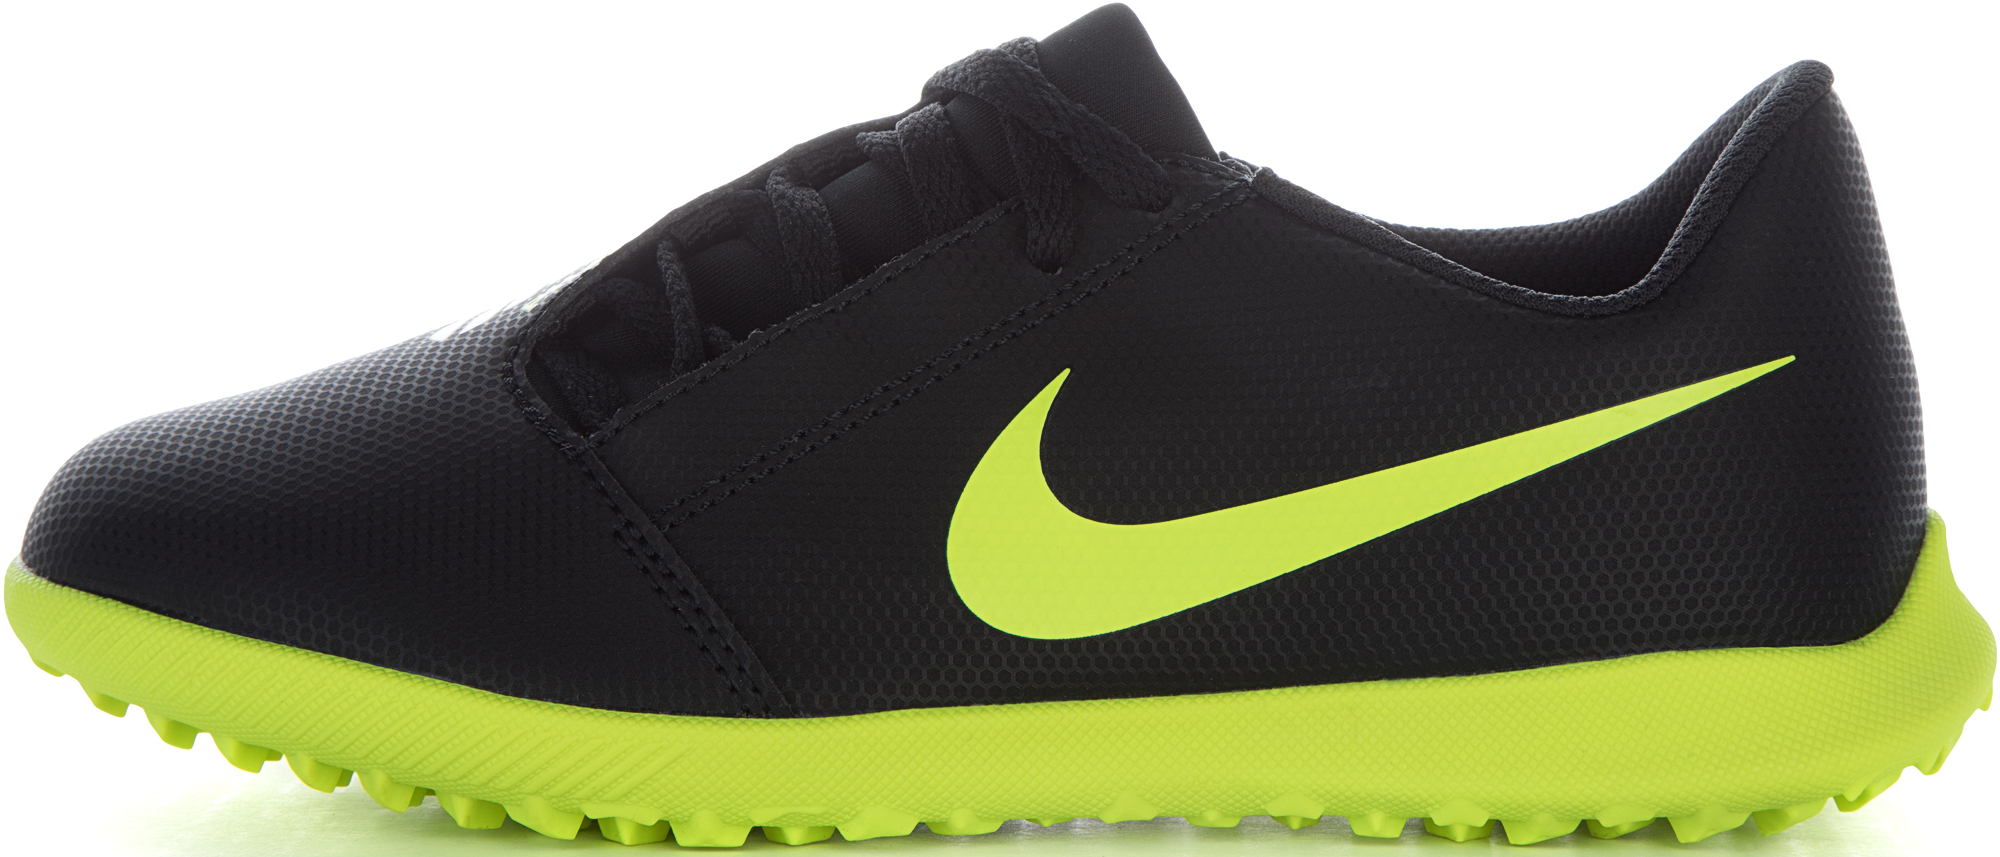 Nike Бутсы для мальчиков Nike Phantom Venom Club Tf, размер 37,5 цена в Москве и Питере